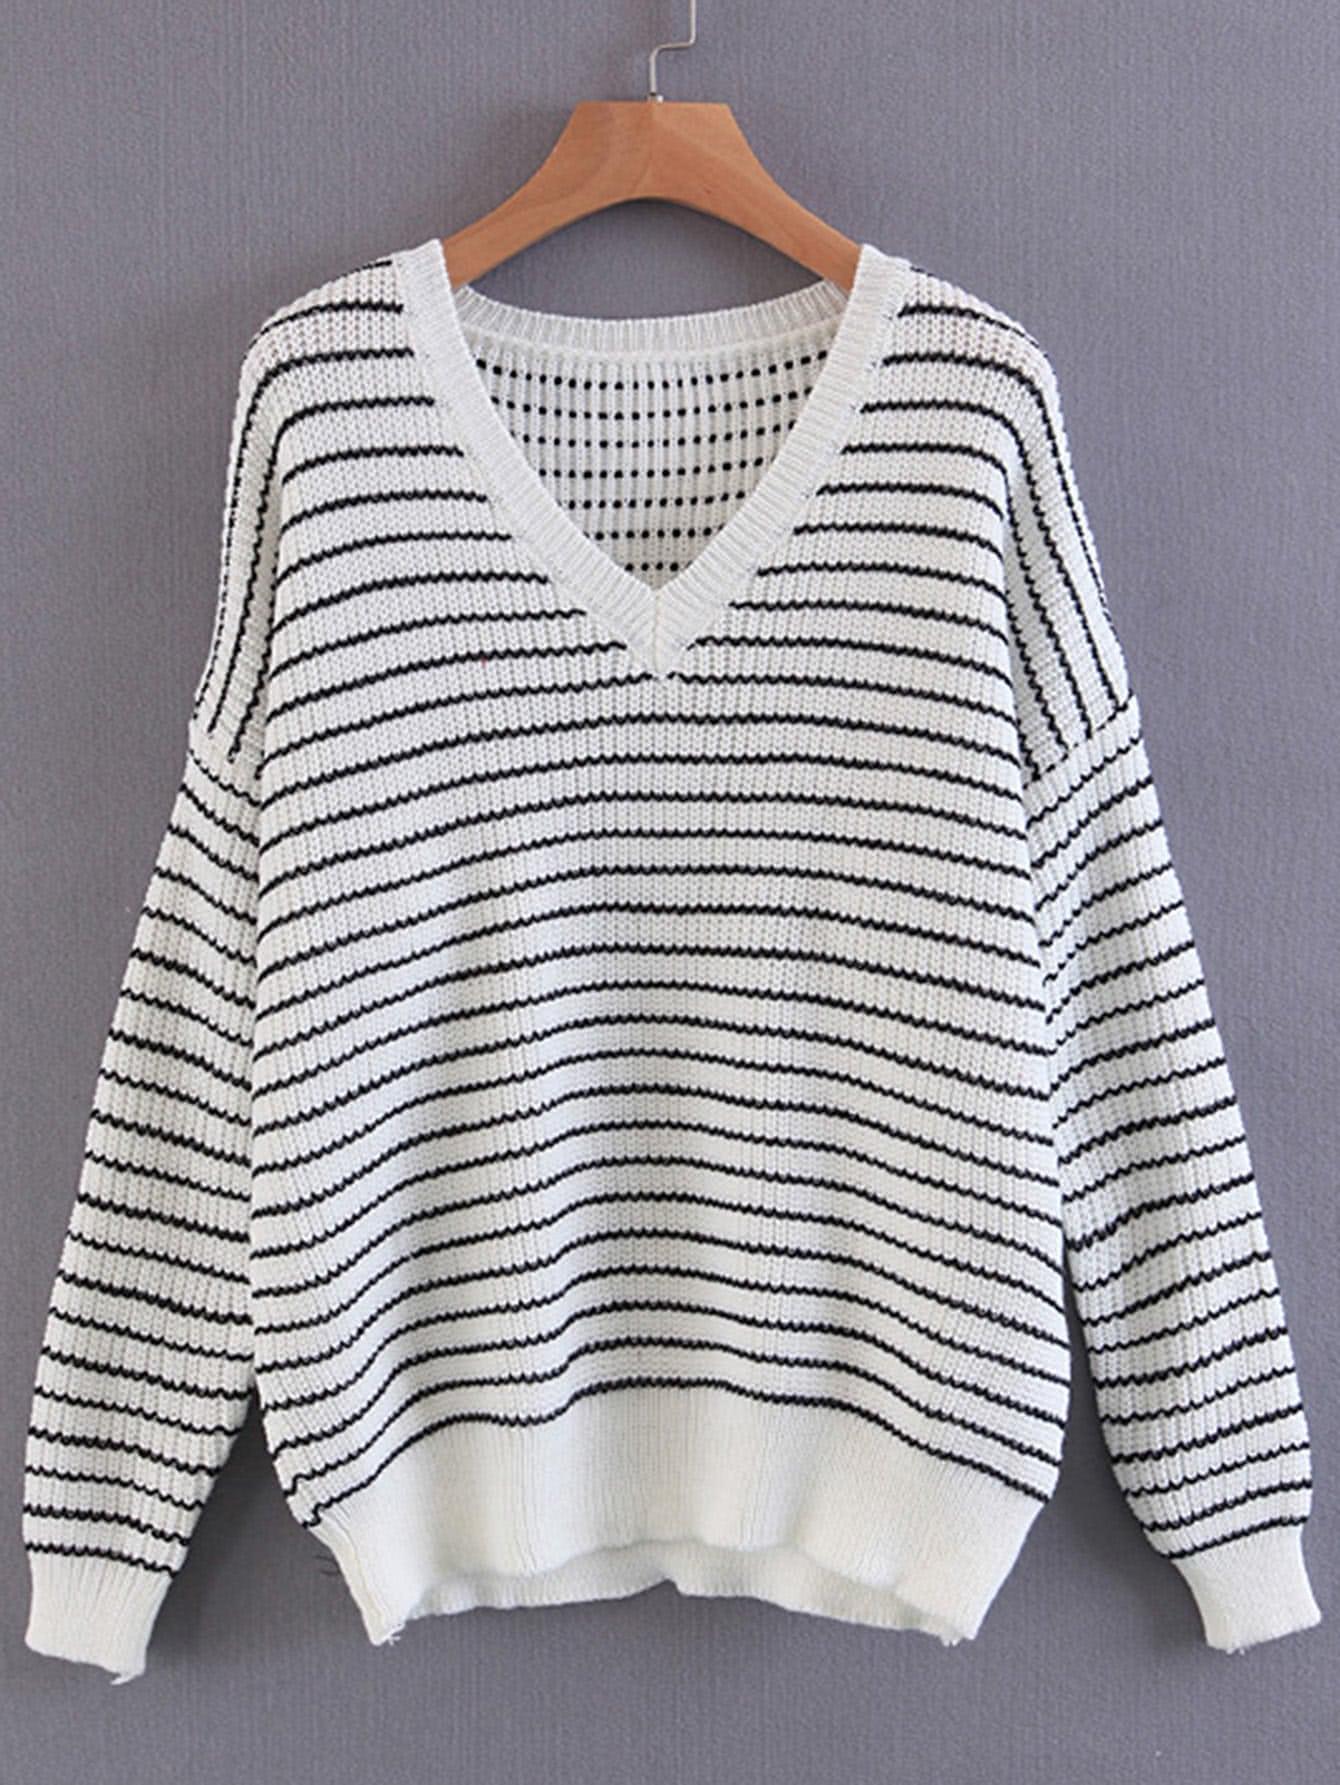 Contrast Striped Drop Shoulder Seam Sweater sweater170814201